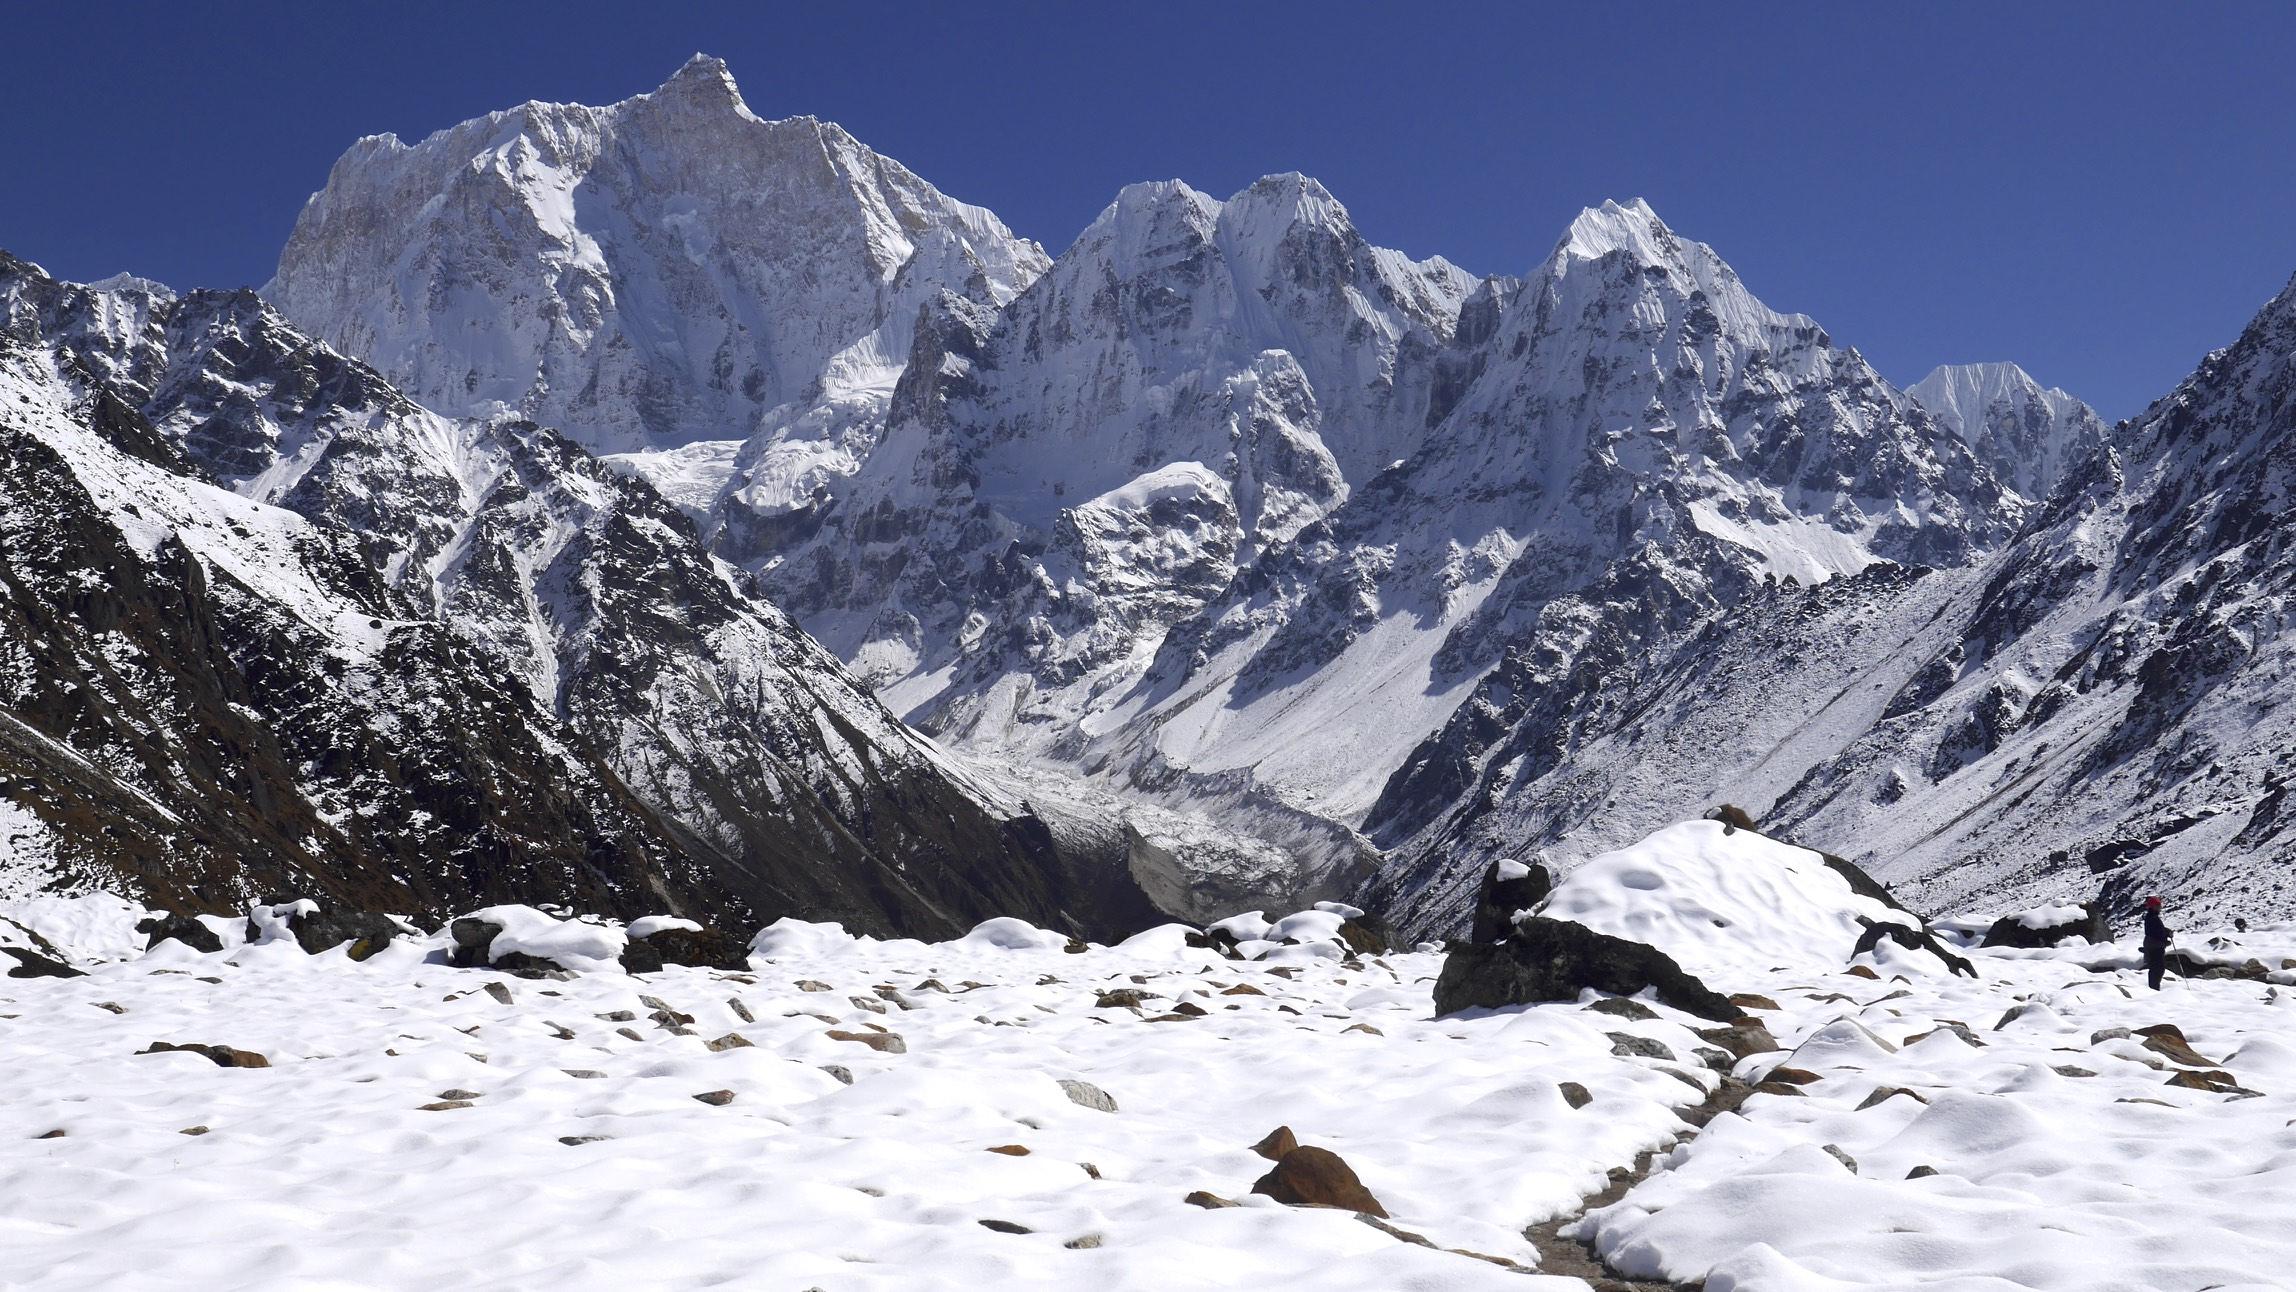 Janu Peak 7,710m, Sobi Thongje 6,670m, Pholesobi Thonje 6,645m and Temachungi 6,044m with the Kumbhakarma Glacier below - hiking above the Nupchu Valley and exploring the area.